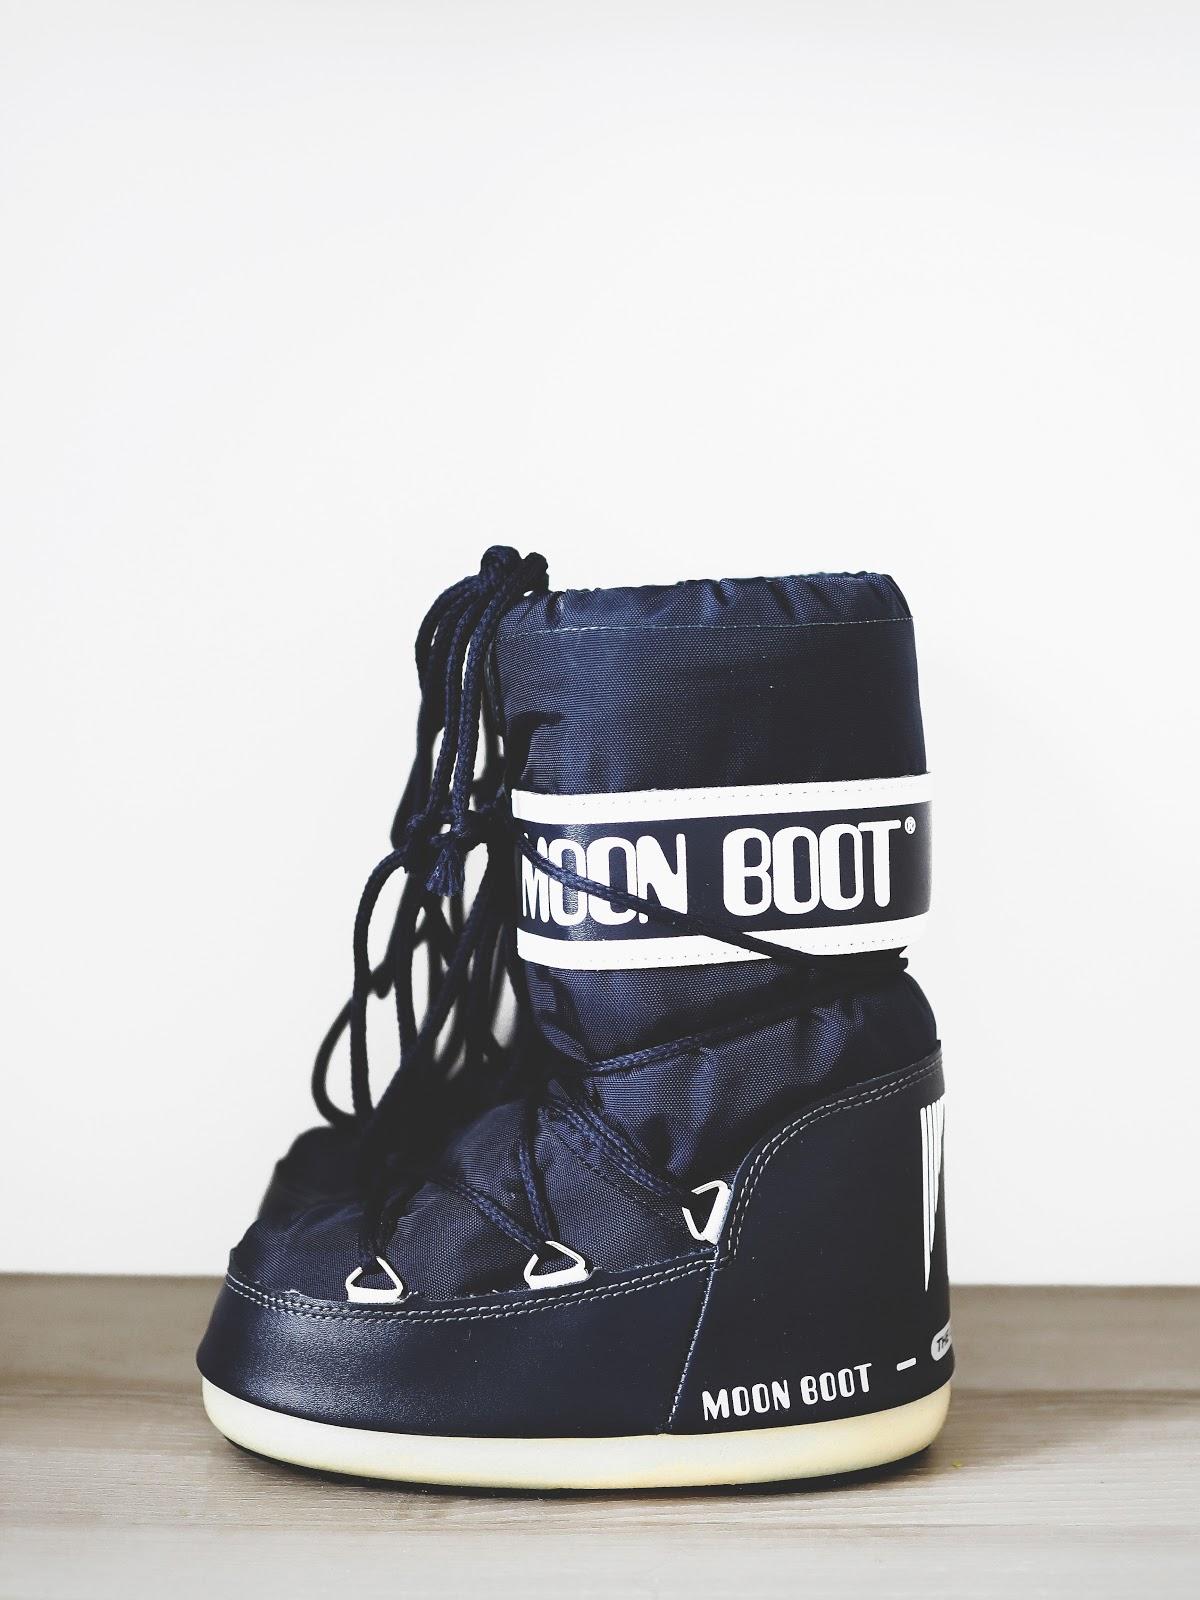 Moon Boot Blue отзыв луноходы